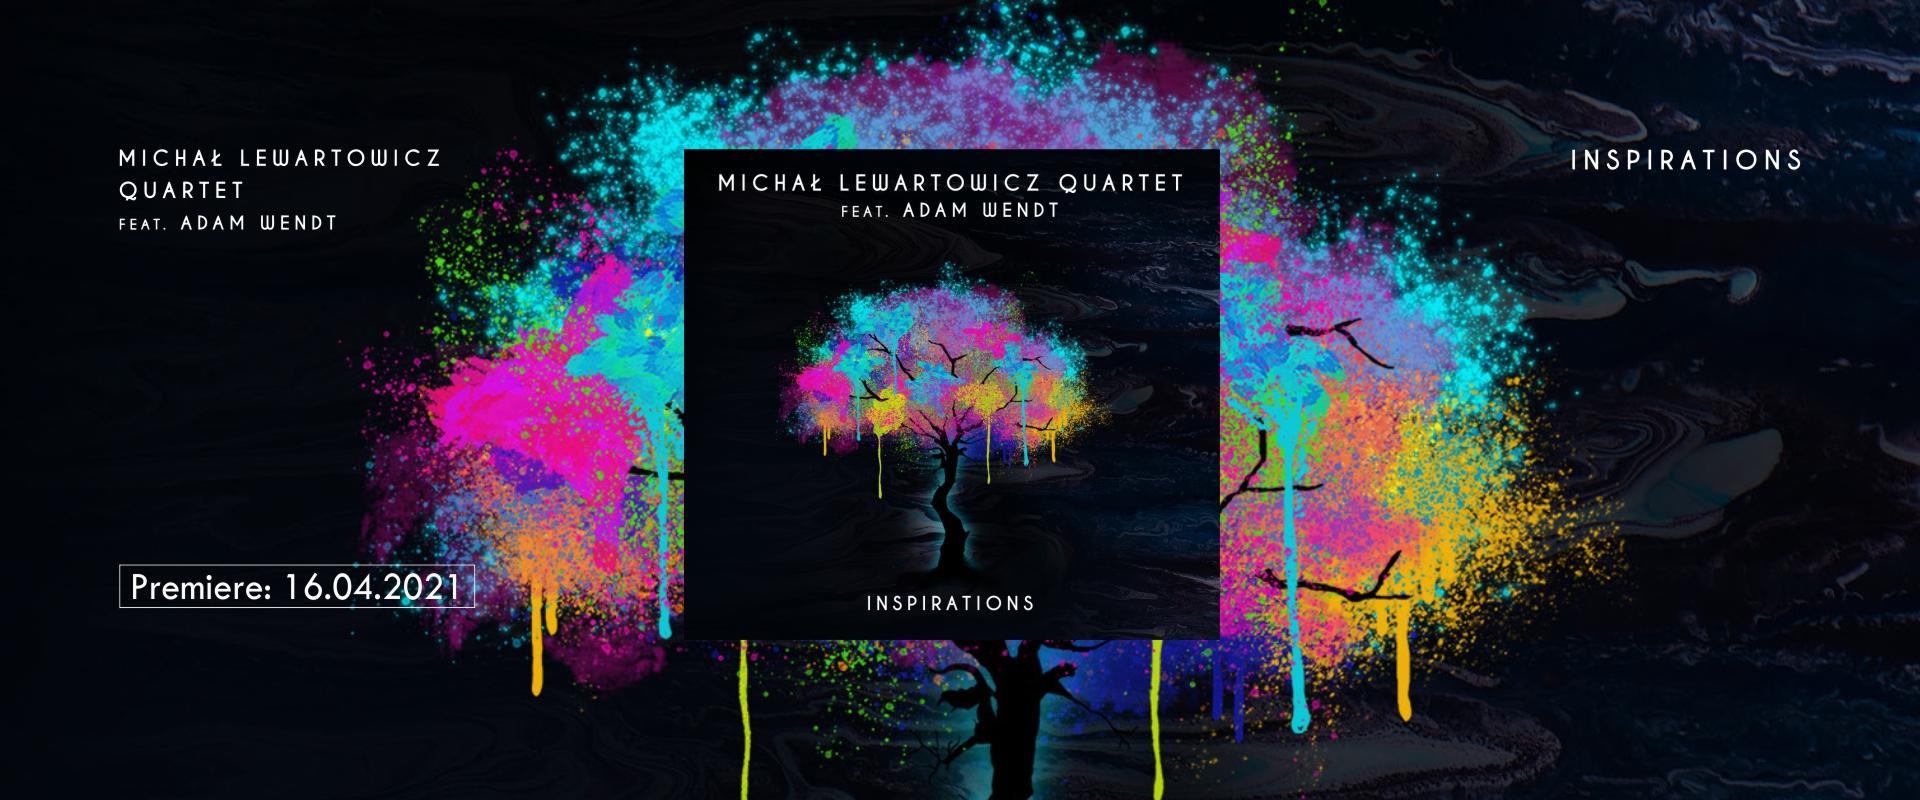 Michał Lewartowicz Quartet - Inspirations baner